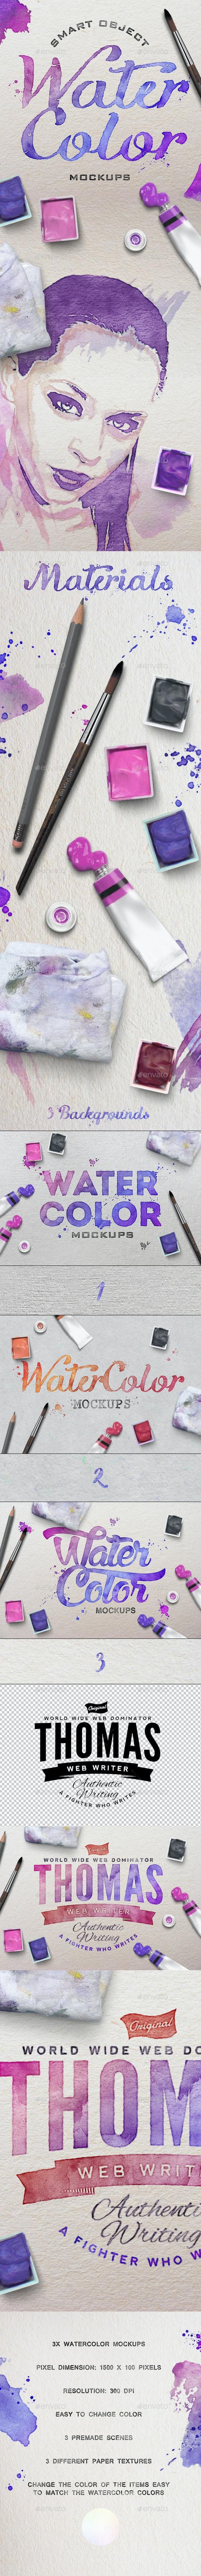 Watercolor Scene Mockups - Hero Images Graphics